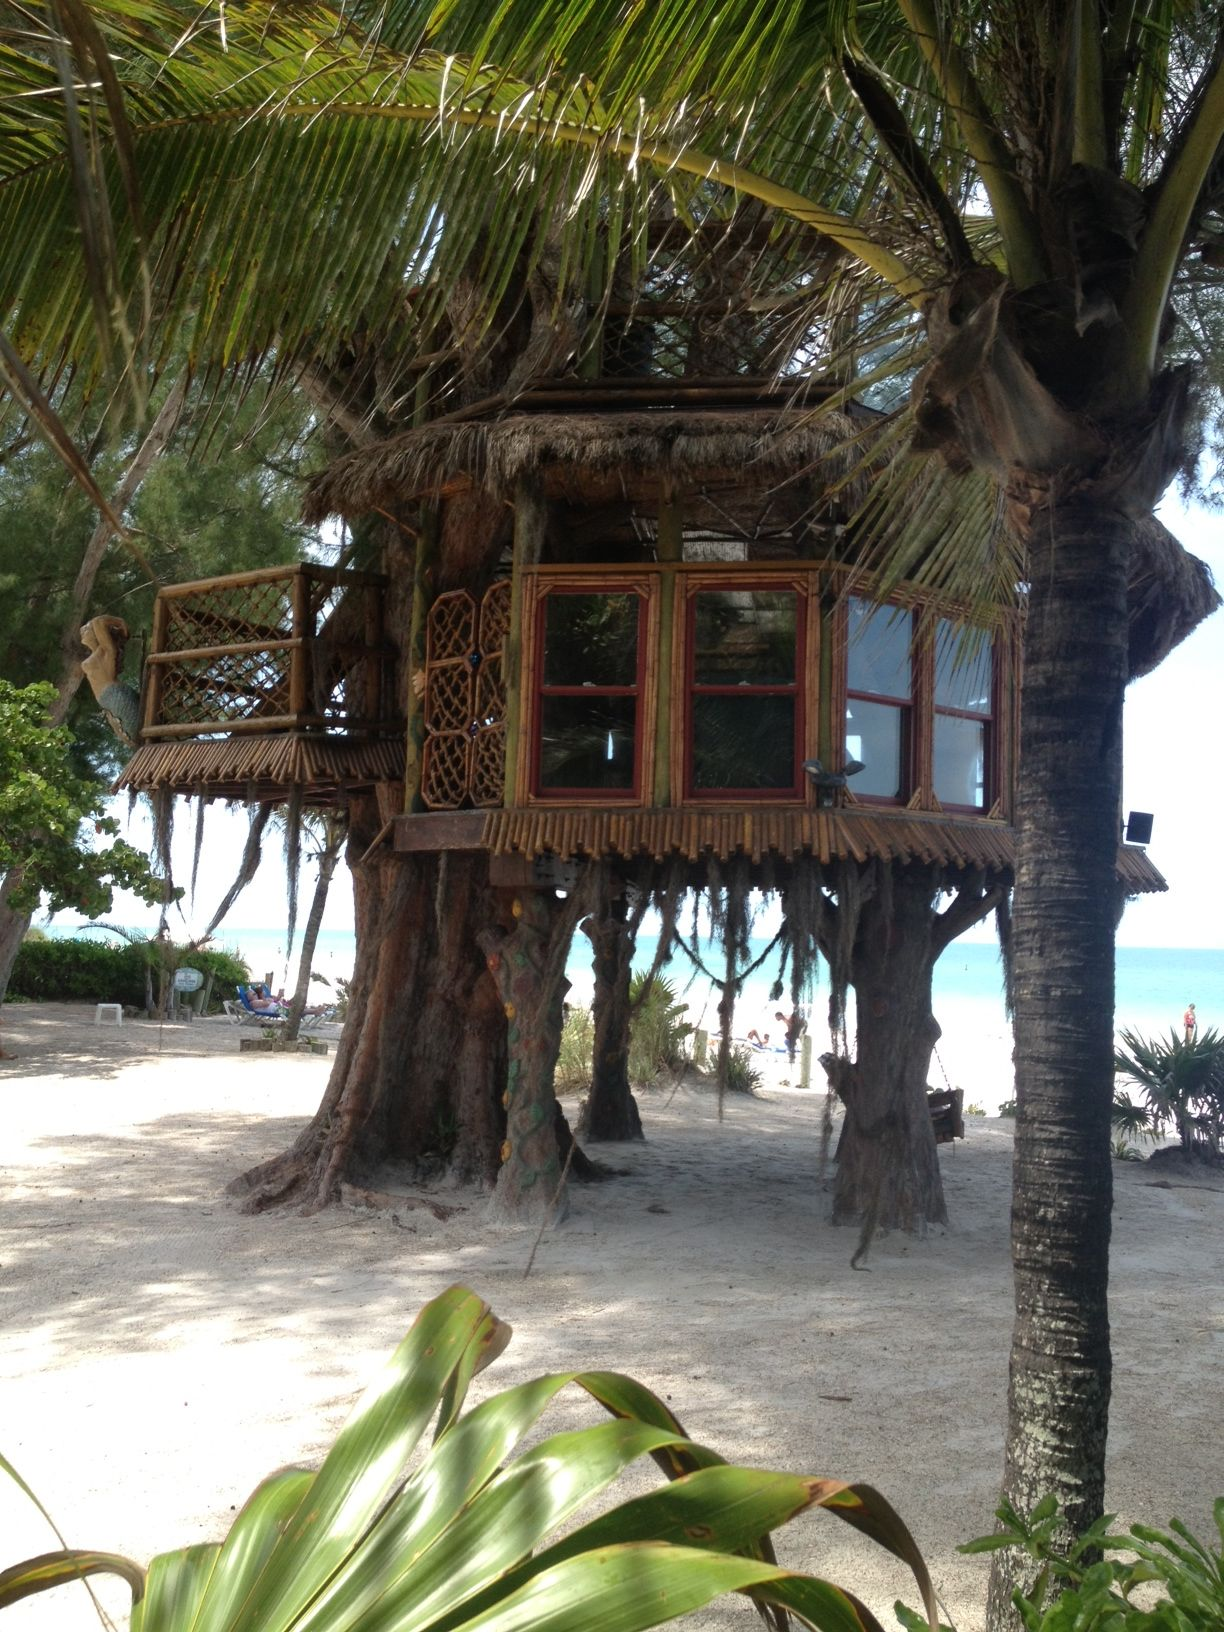 Treehouse on the beach in Holmes Beach, on Anna Maria Island, Florida. Taken June 11, 2013.